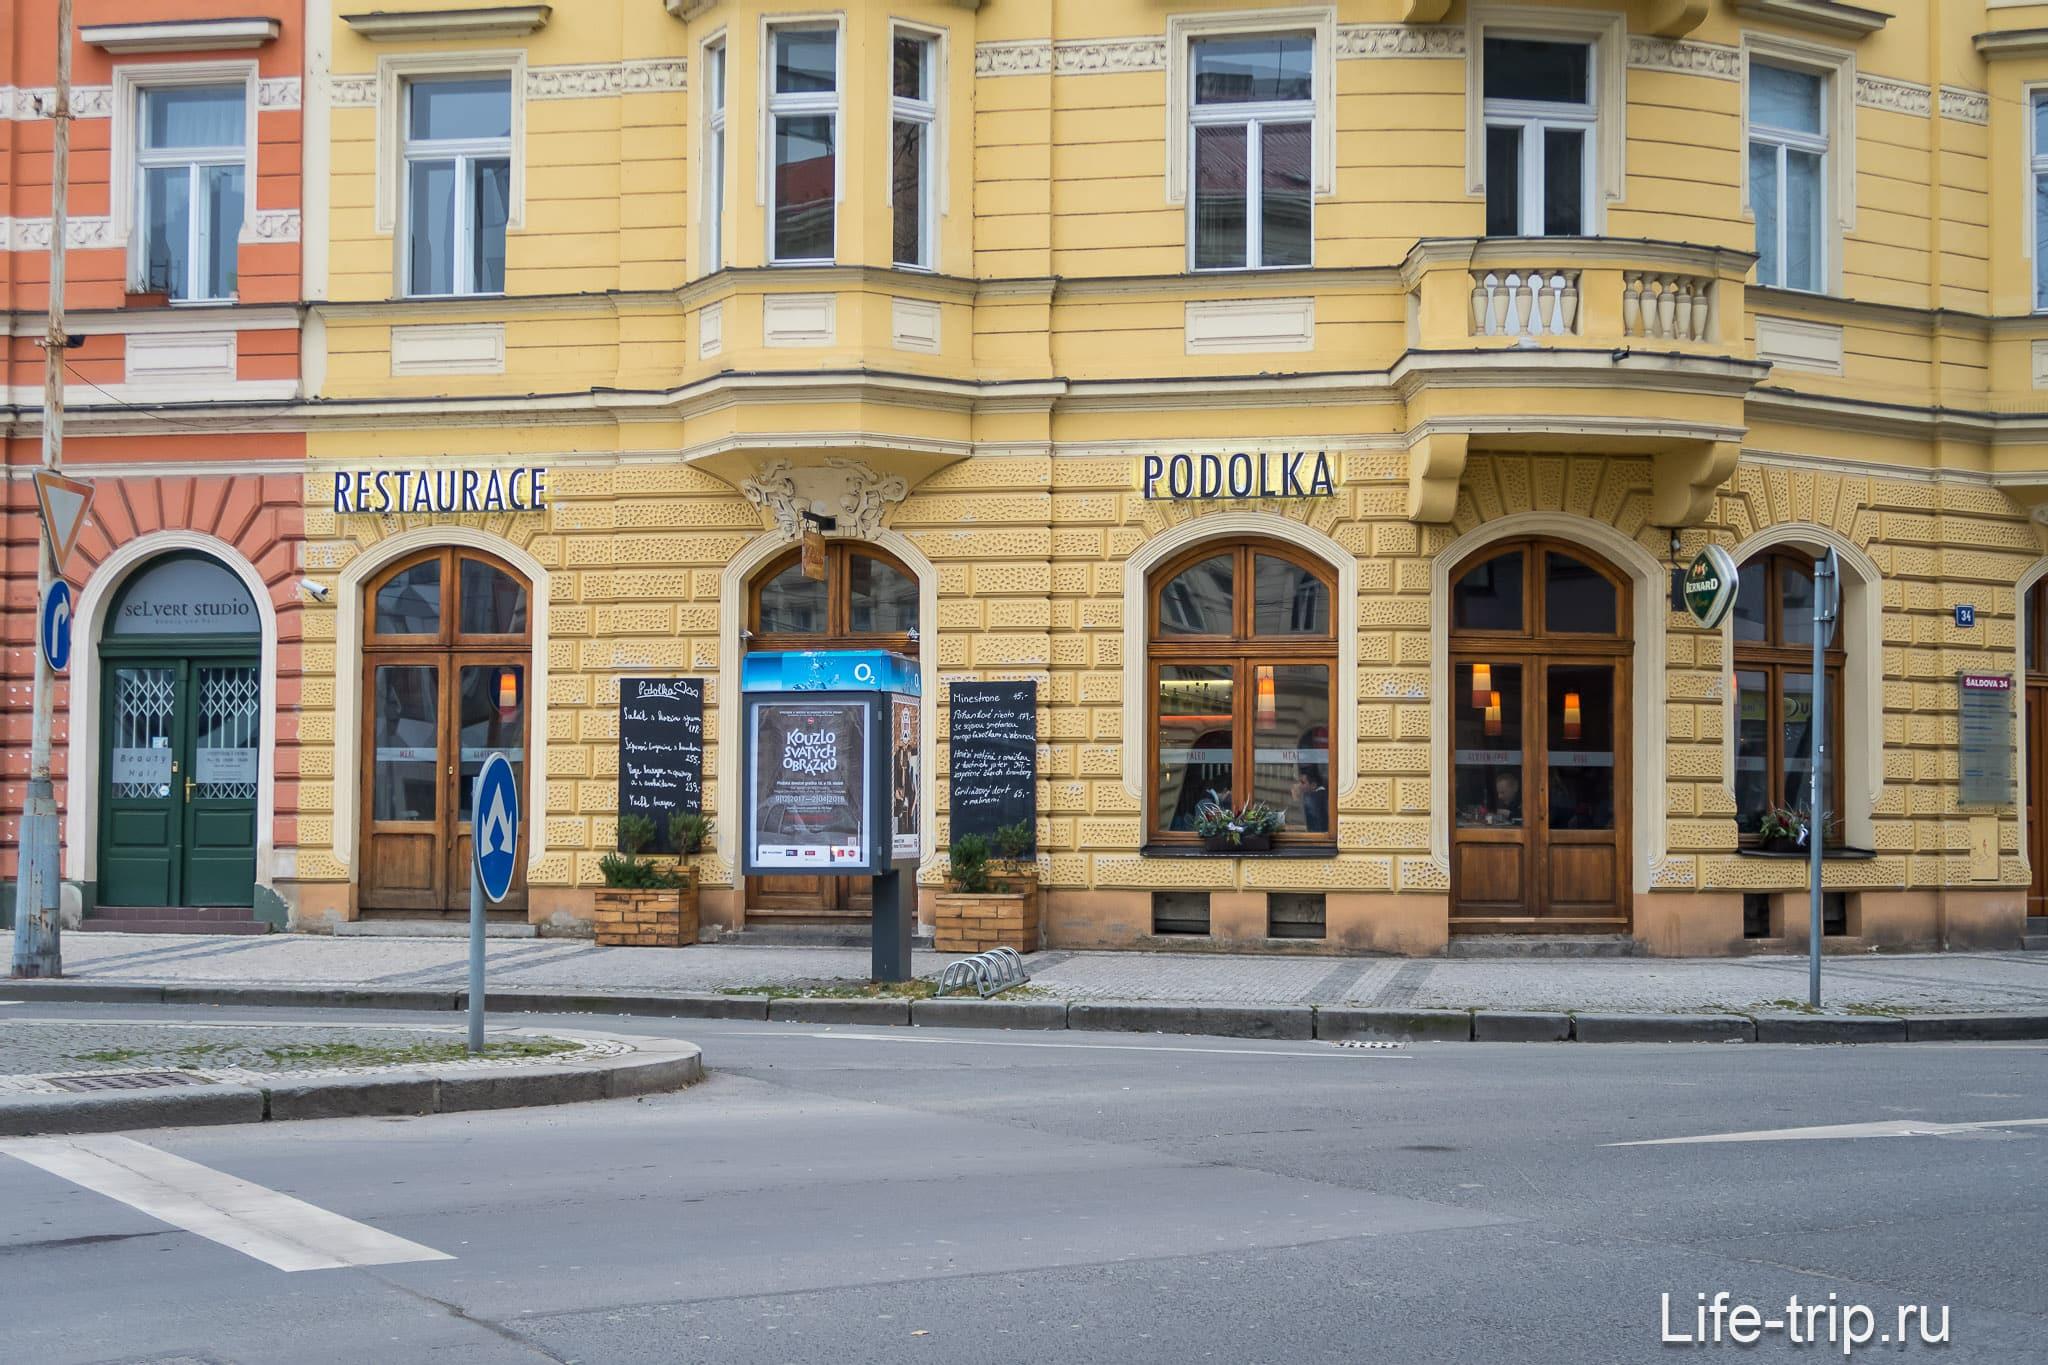 Ресторан Podolka в Праге